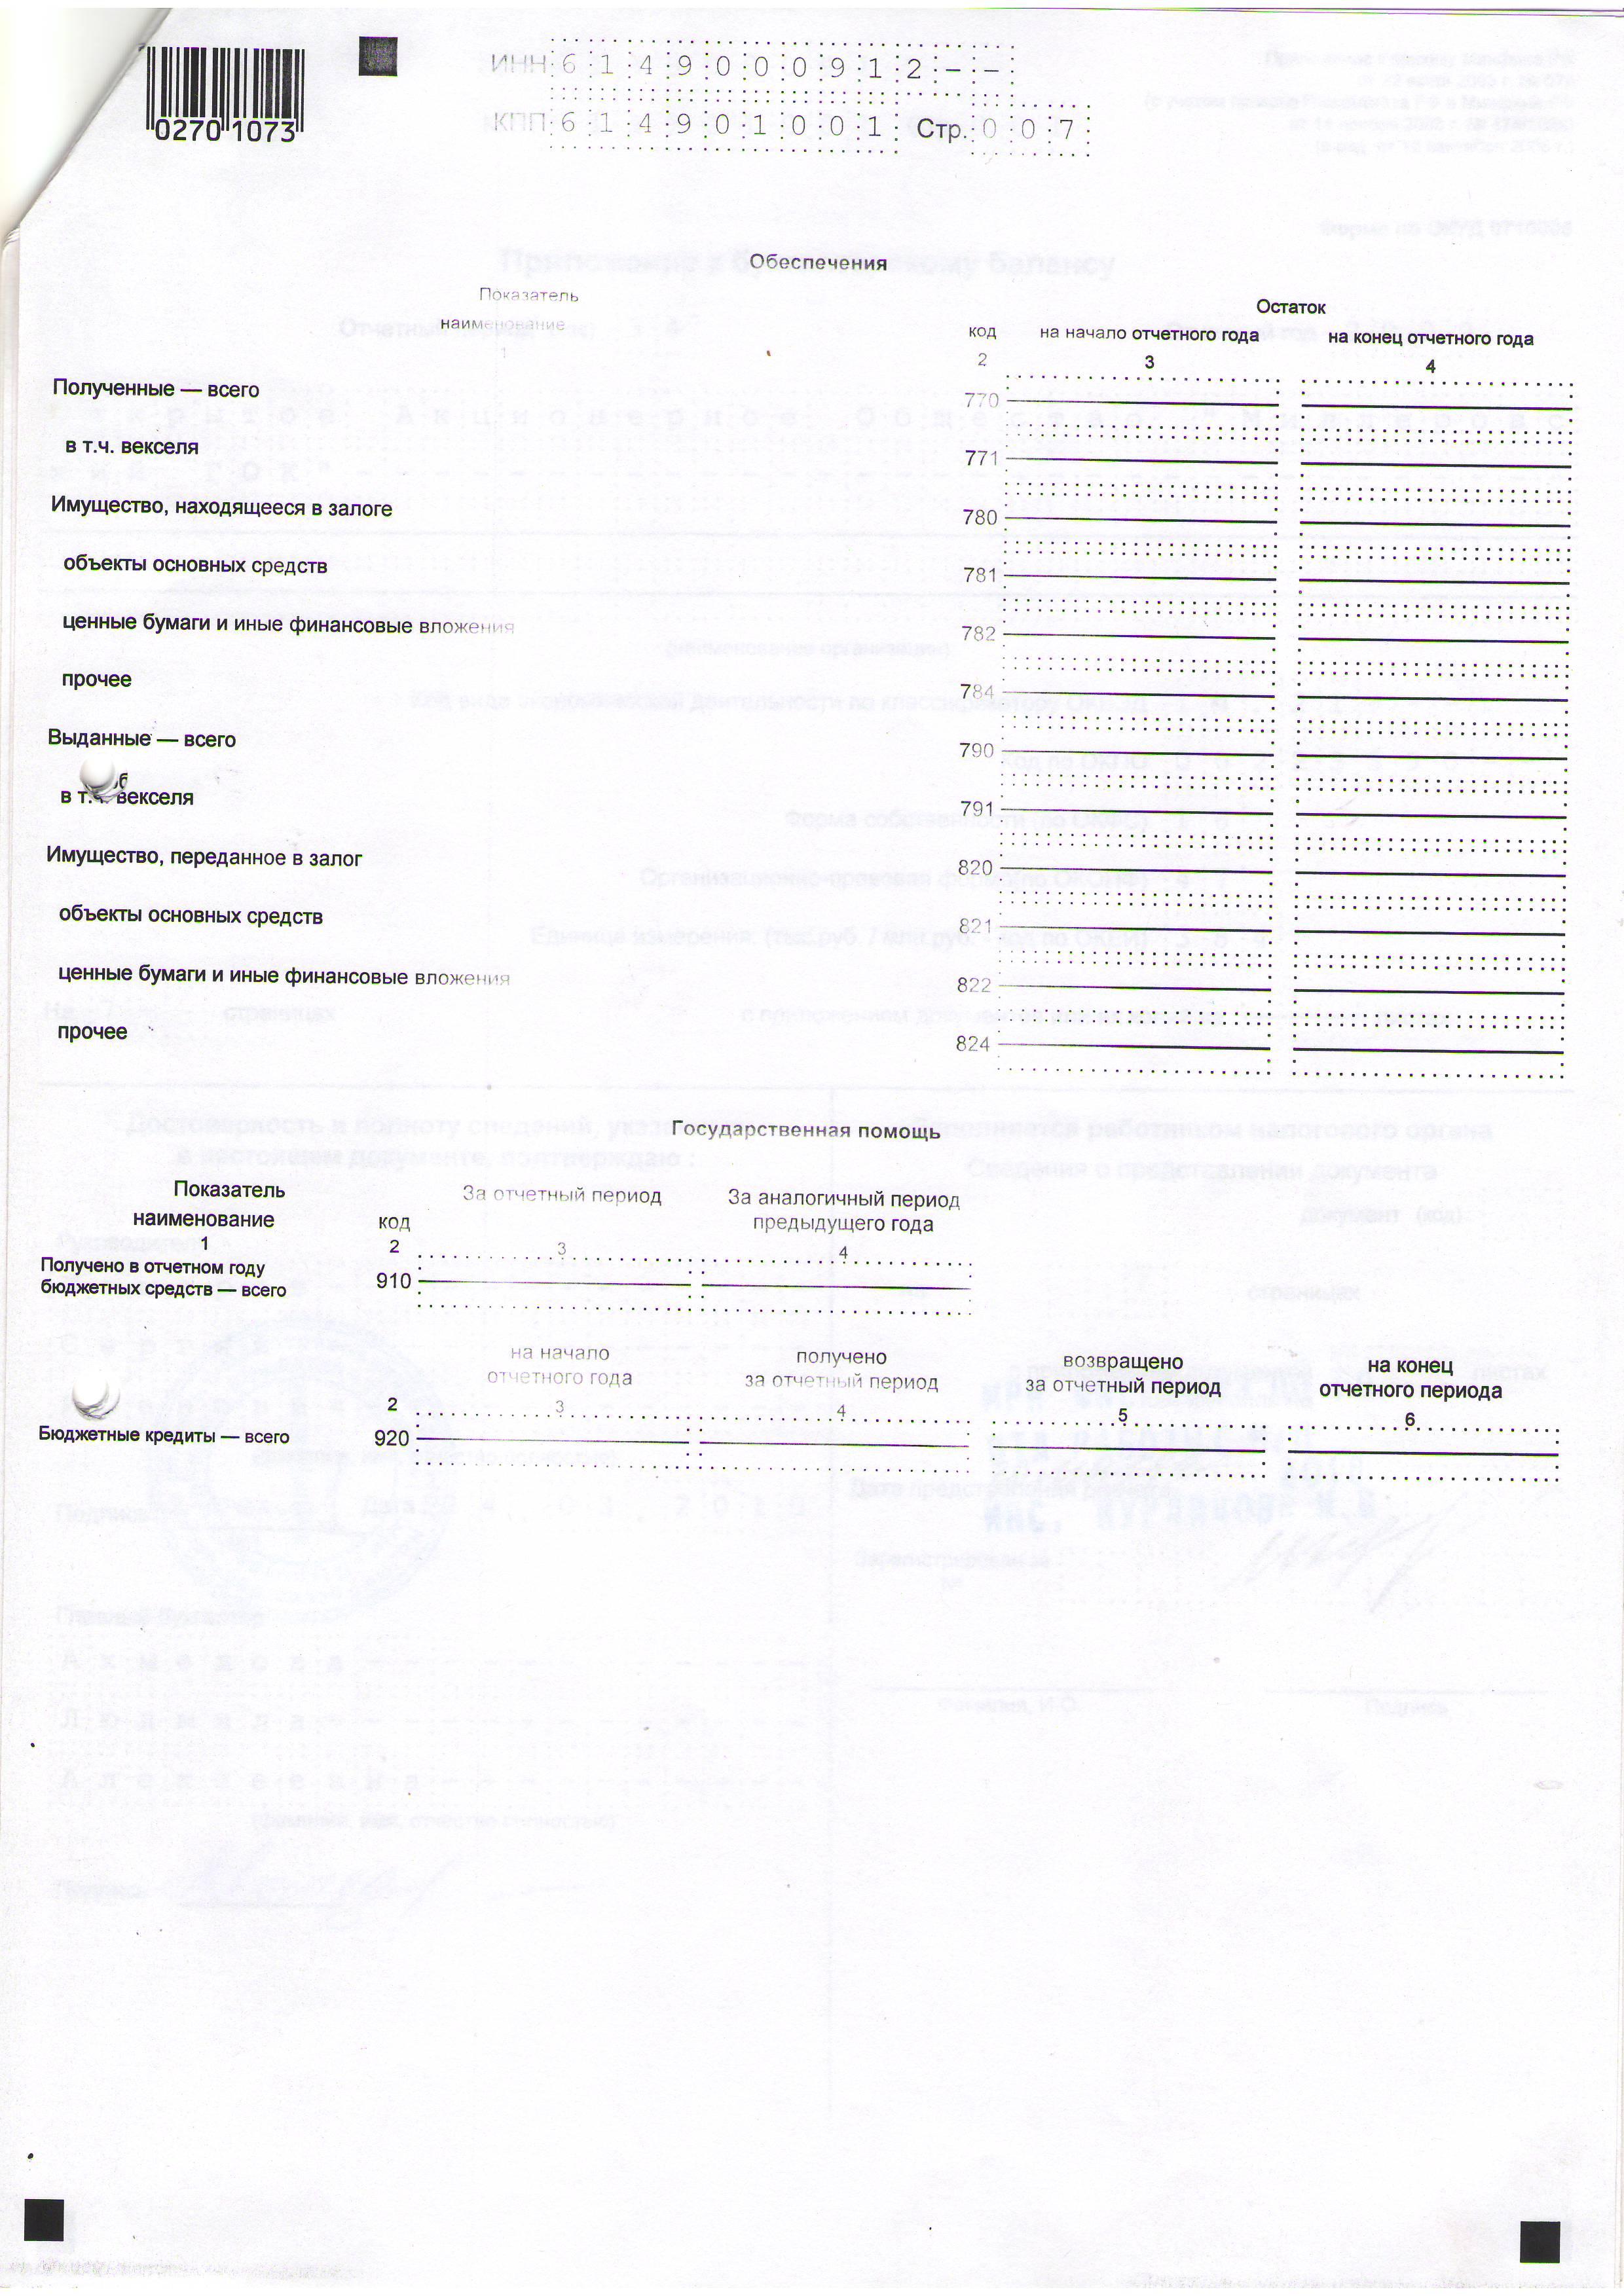 Oтчеты 2010 г 1 годовой отчет за 2010 отчет